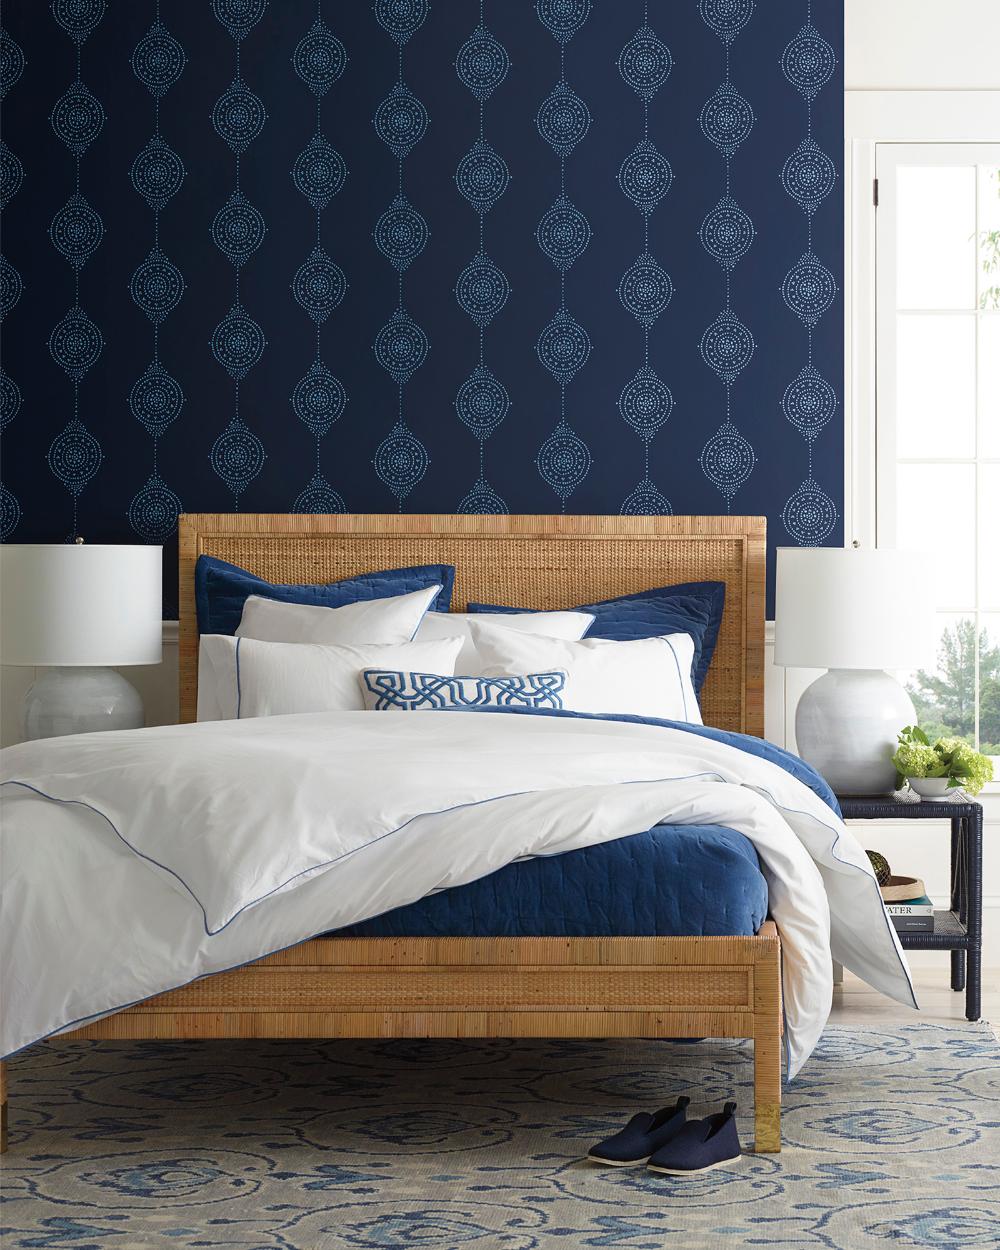 Striped Wallpaper, Bedroom Sitting